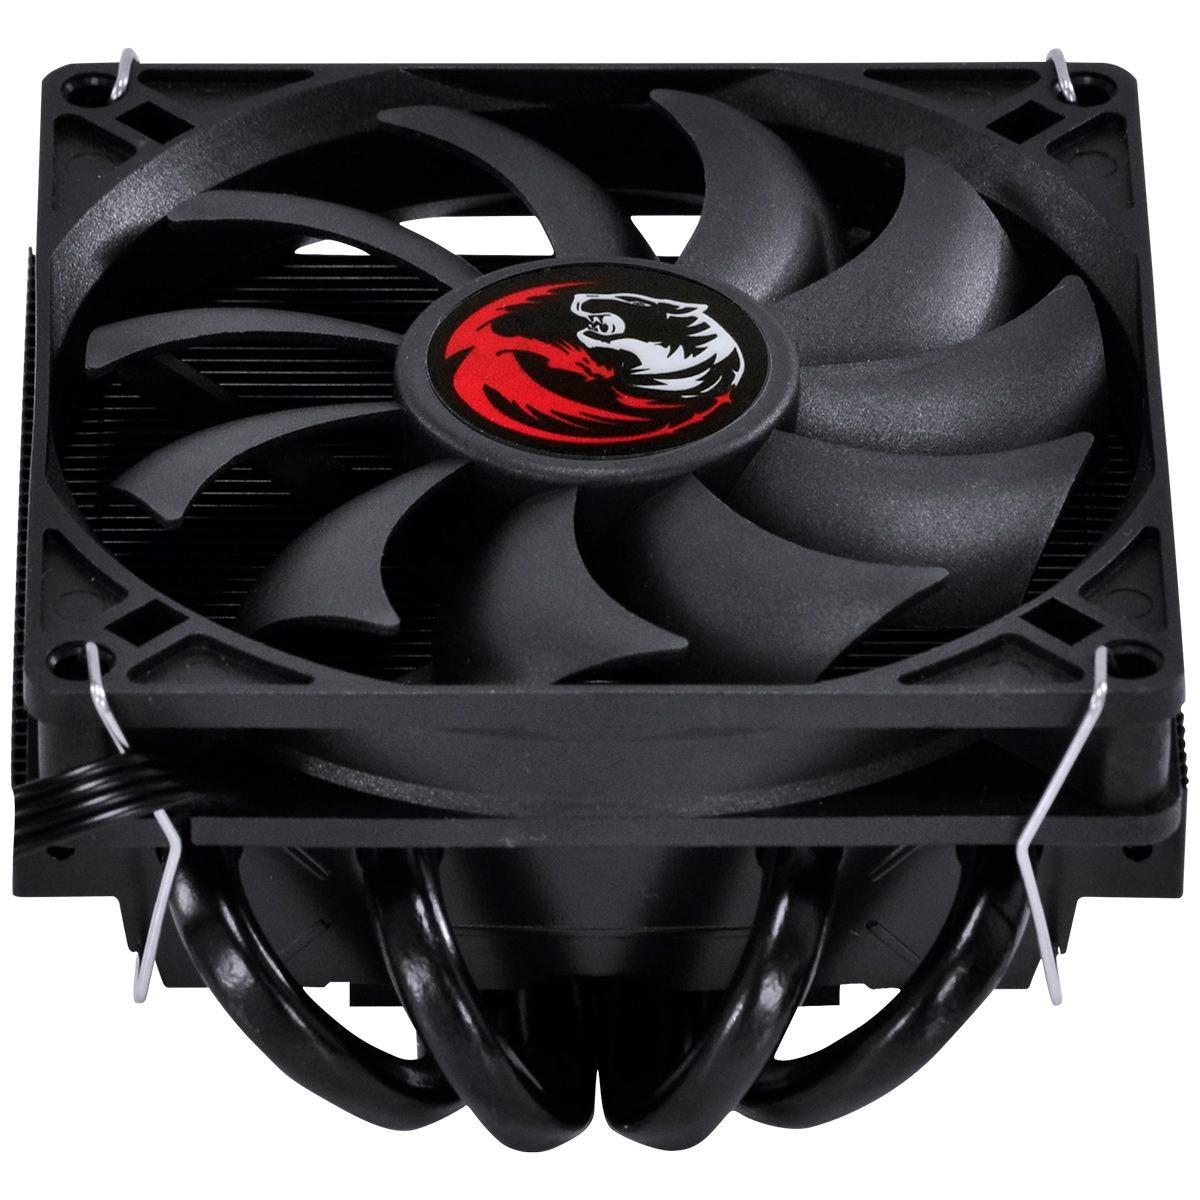 Cooler para Processador Intel/AMD PCYES NÓTUS LP 93mm TDP100W 4 Heatpipes Low Profile -  PAC93PTSL